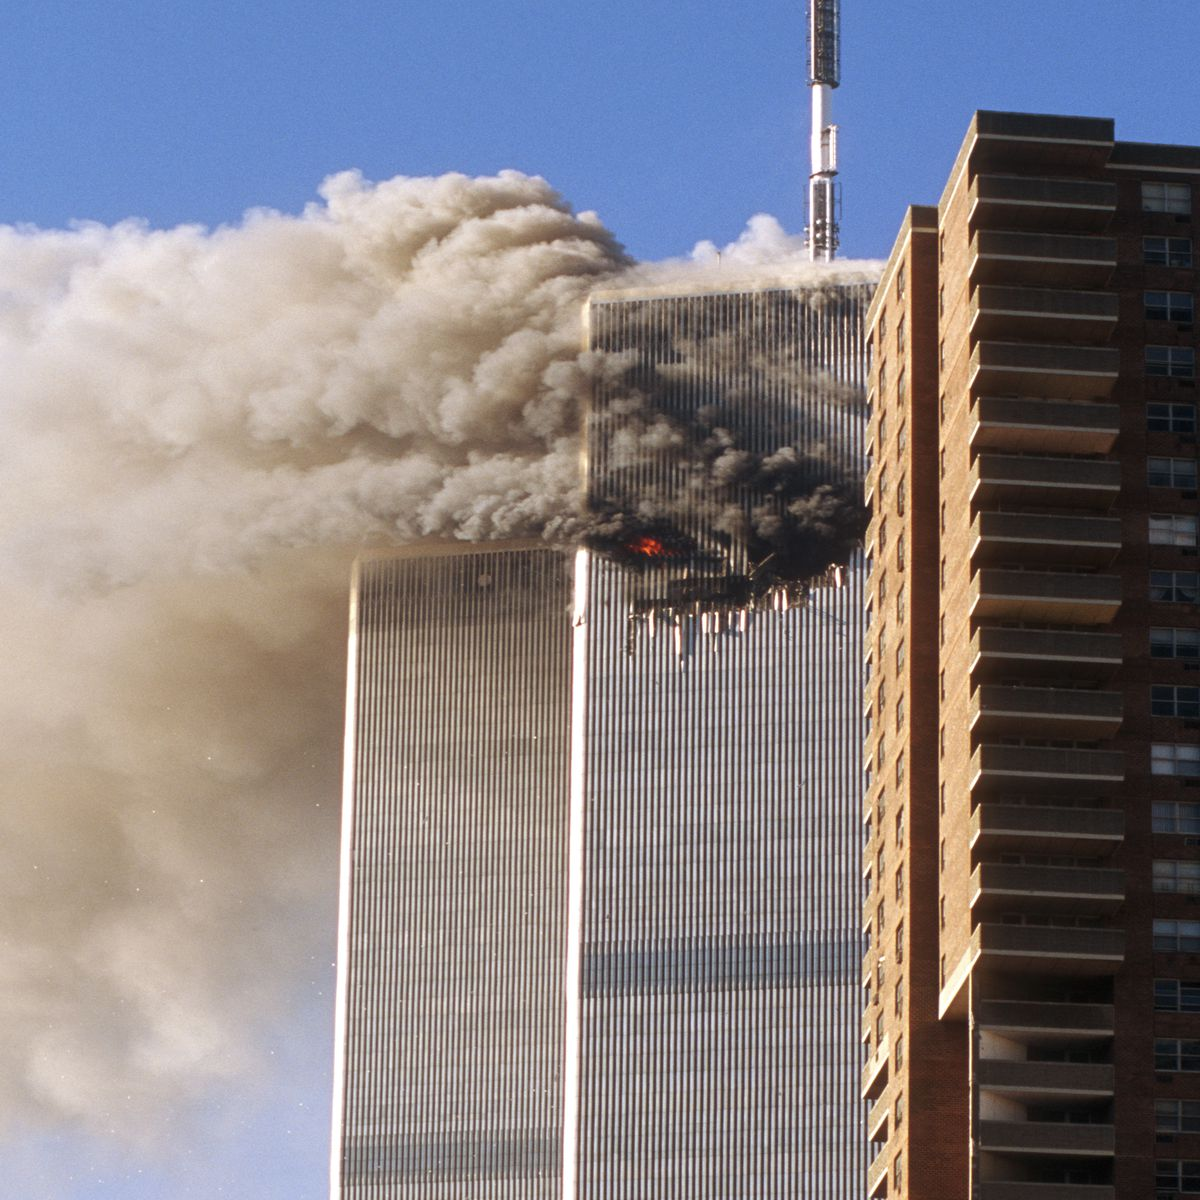 twin towers smoldering